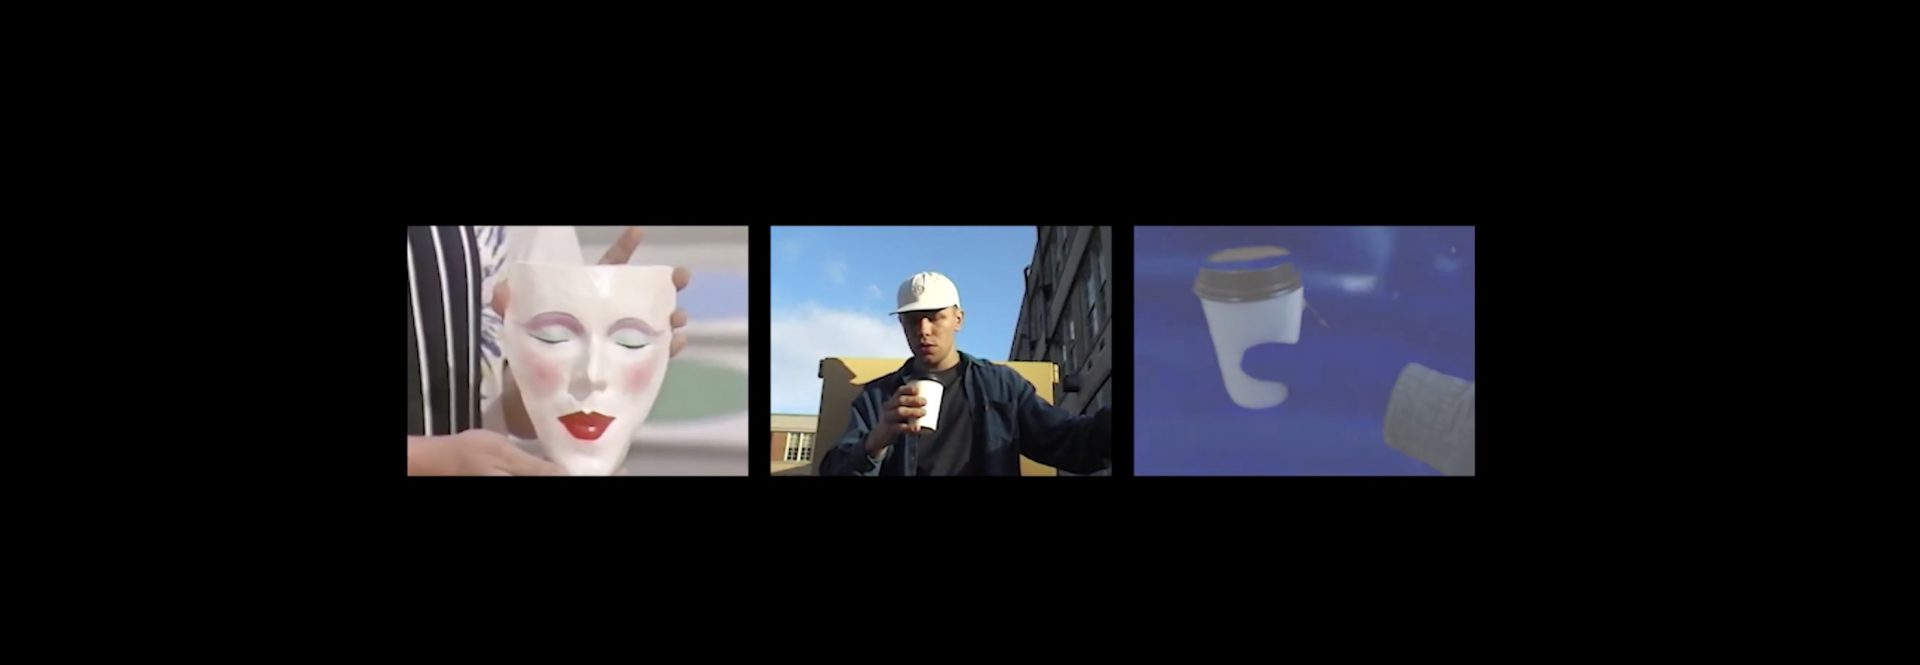 Ivan Ave-NuPath-Video